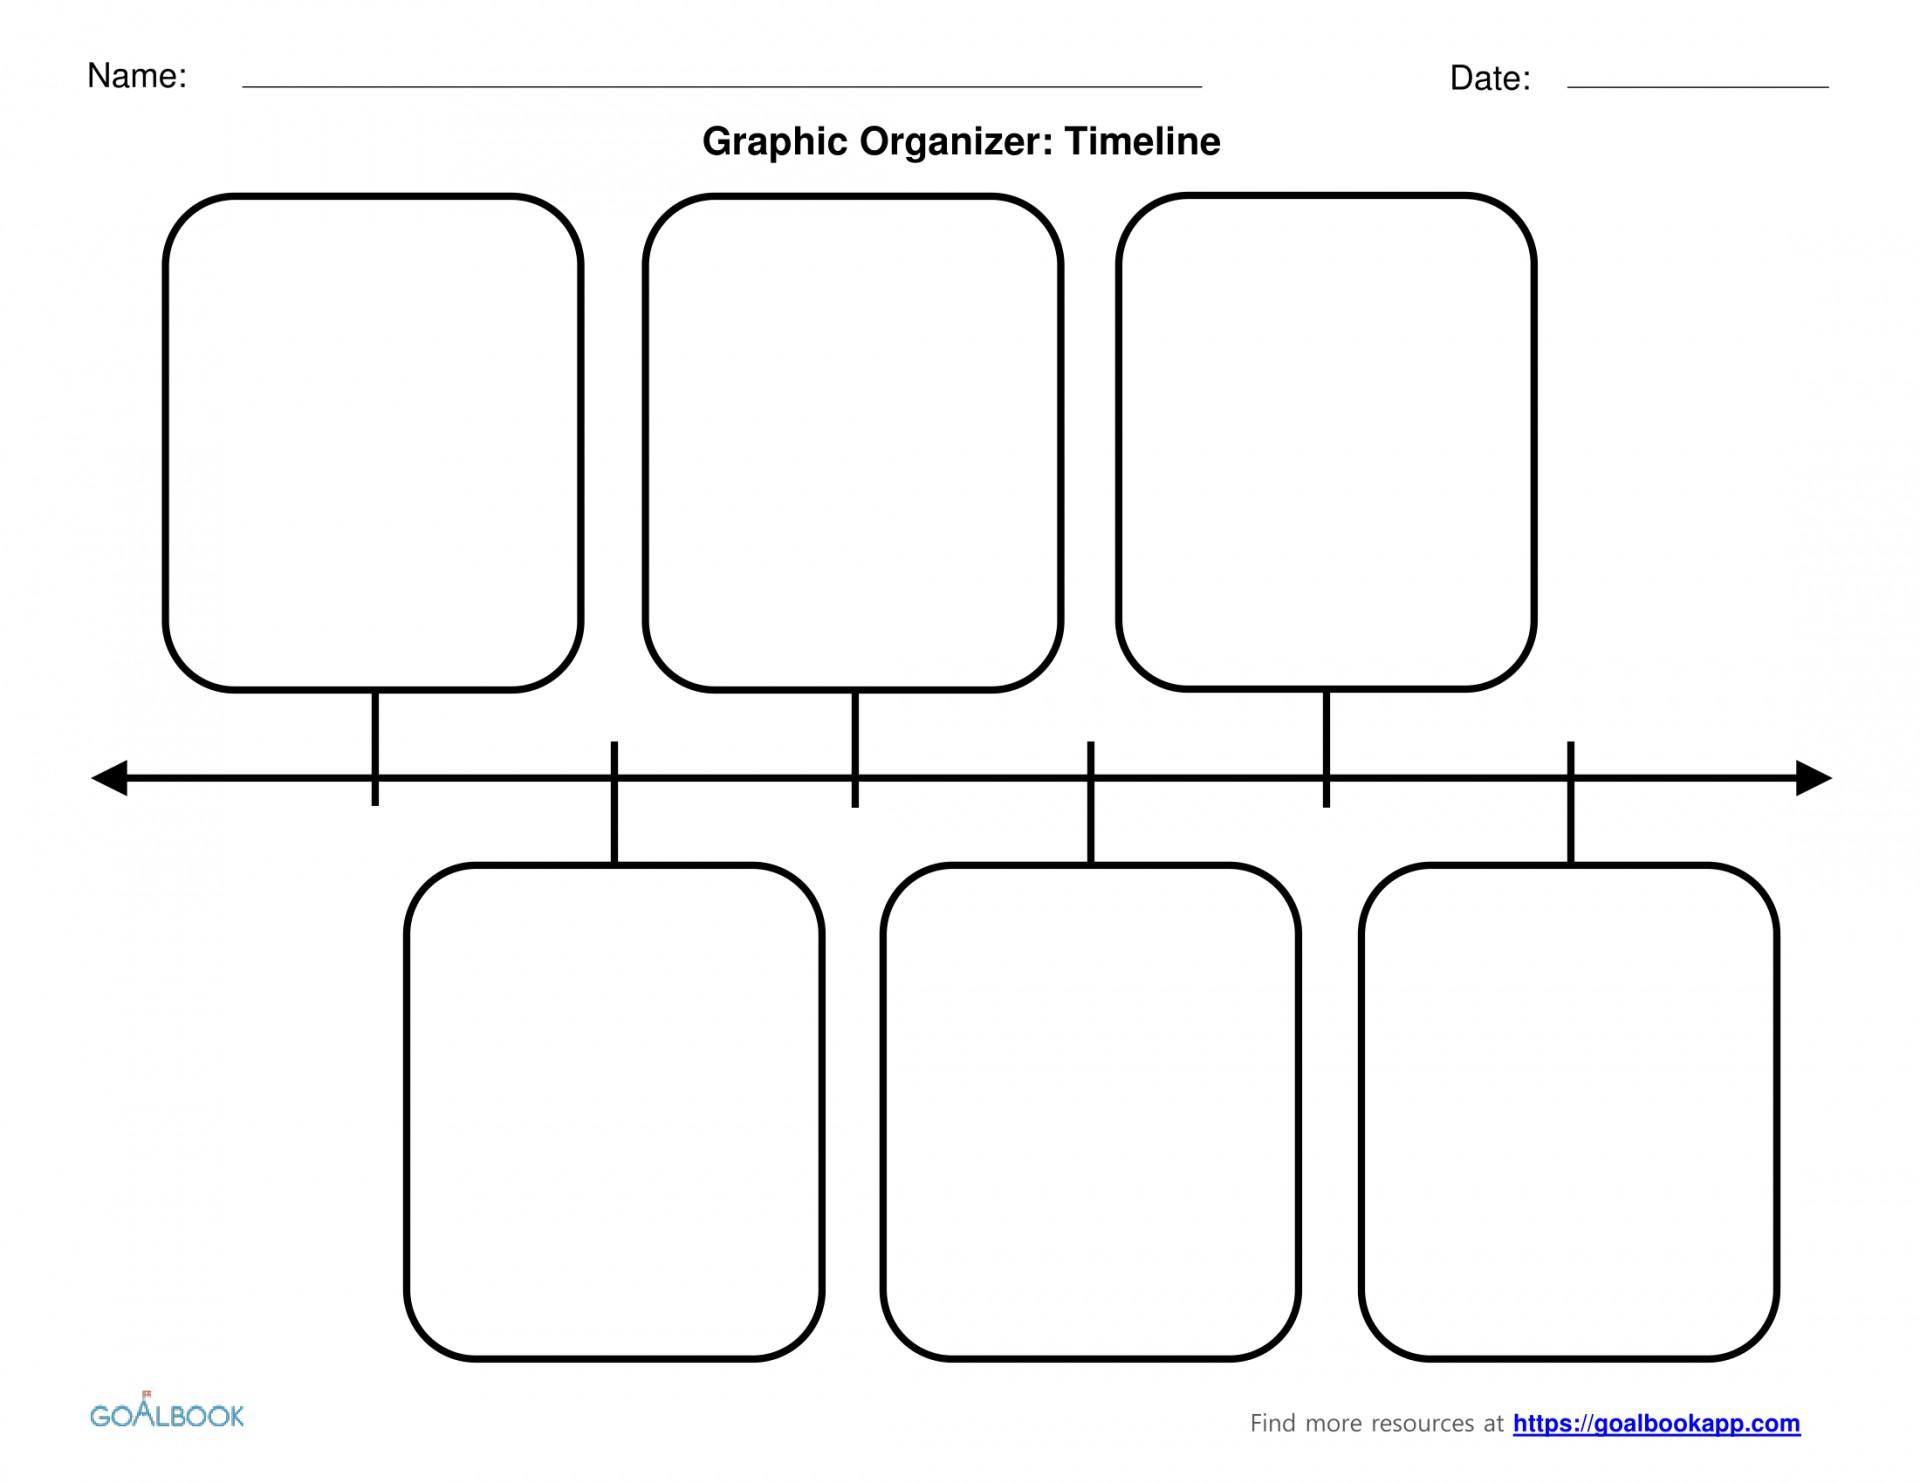 018 03 Timeline Blank Essay Example Five Paragraph Graphic Wonderful Organizer High School Definition 5 Pdf 1920